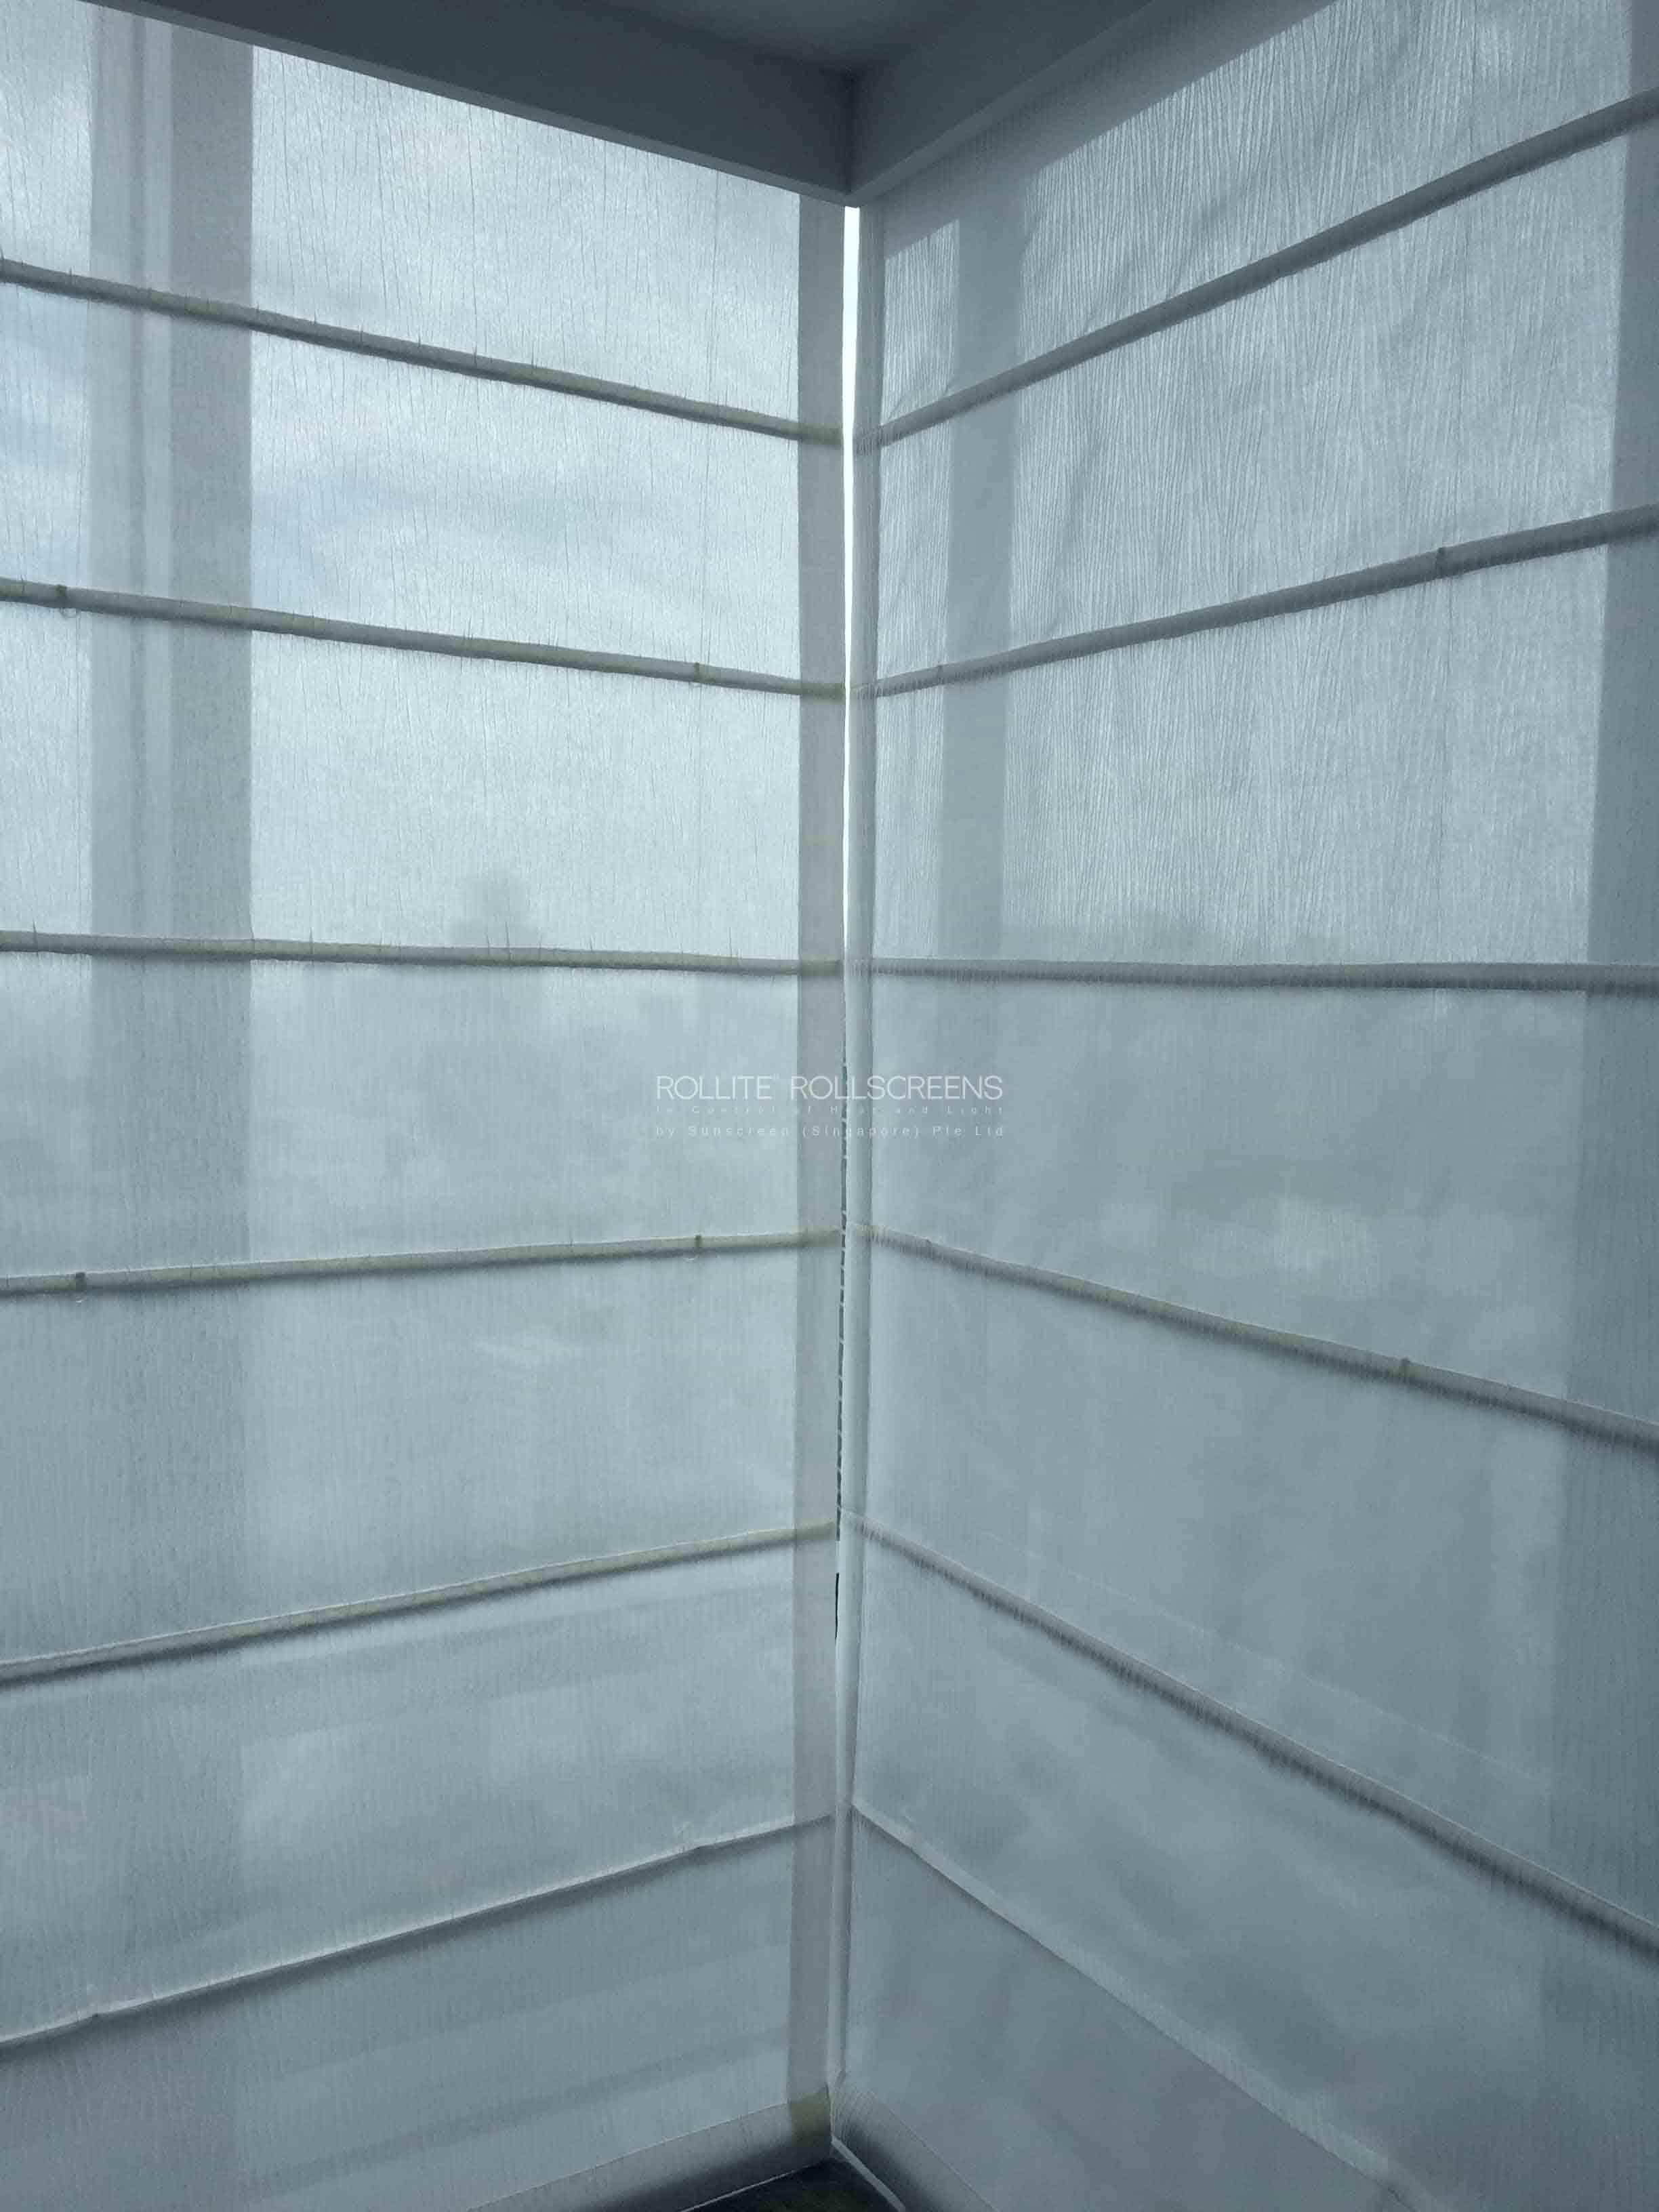 Sunscreen-Singapore_Rollite-Rollscreens-63